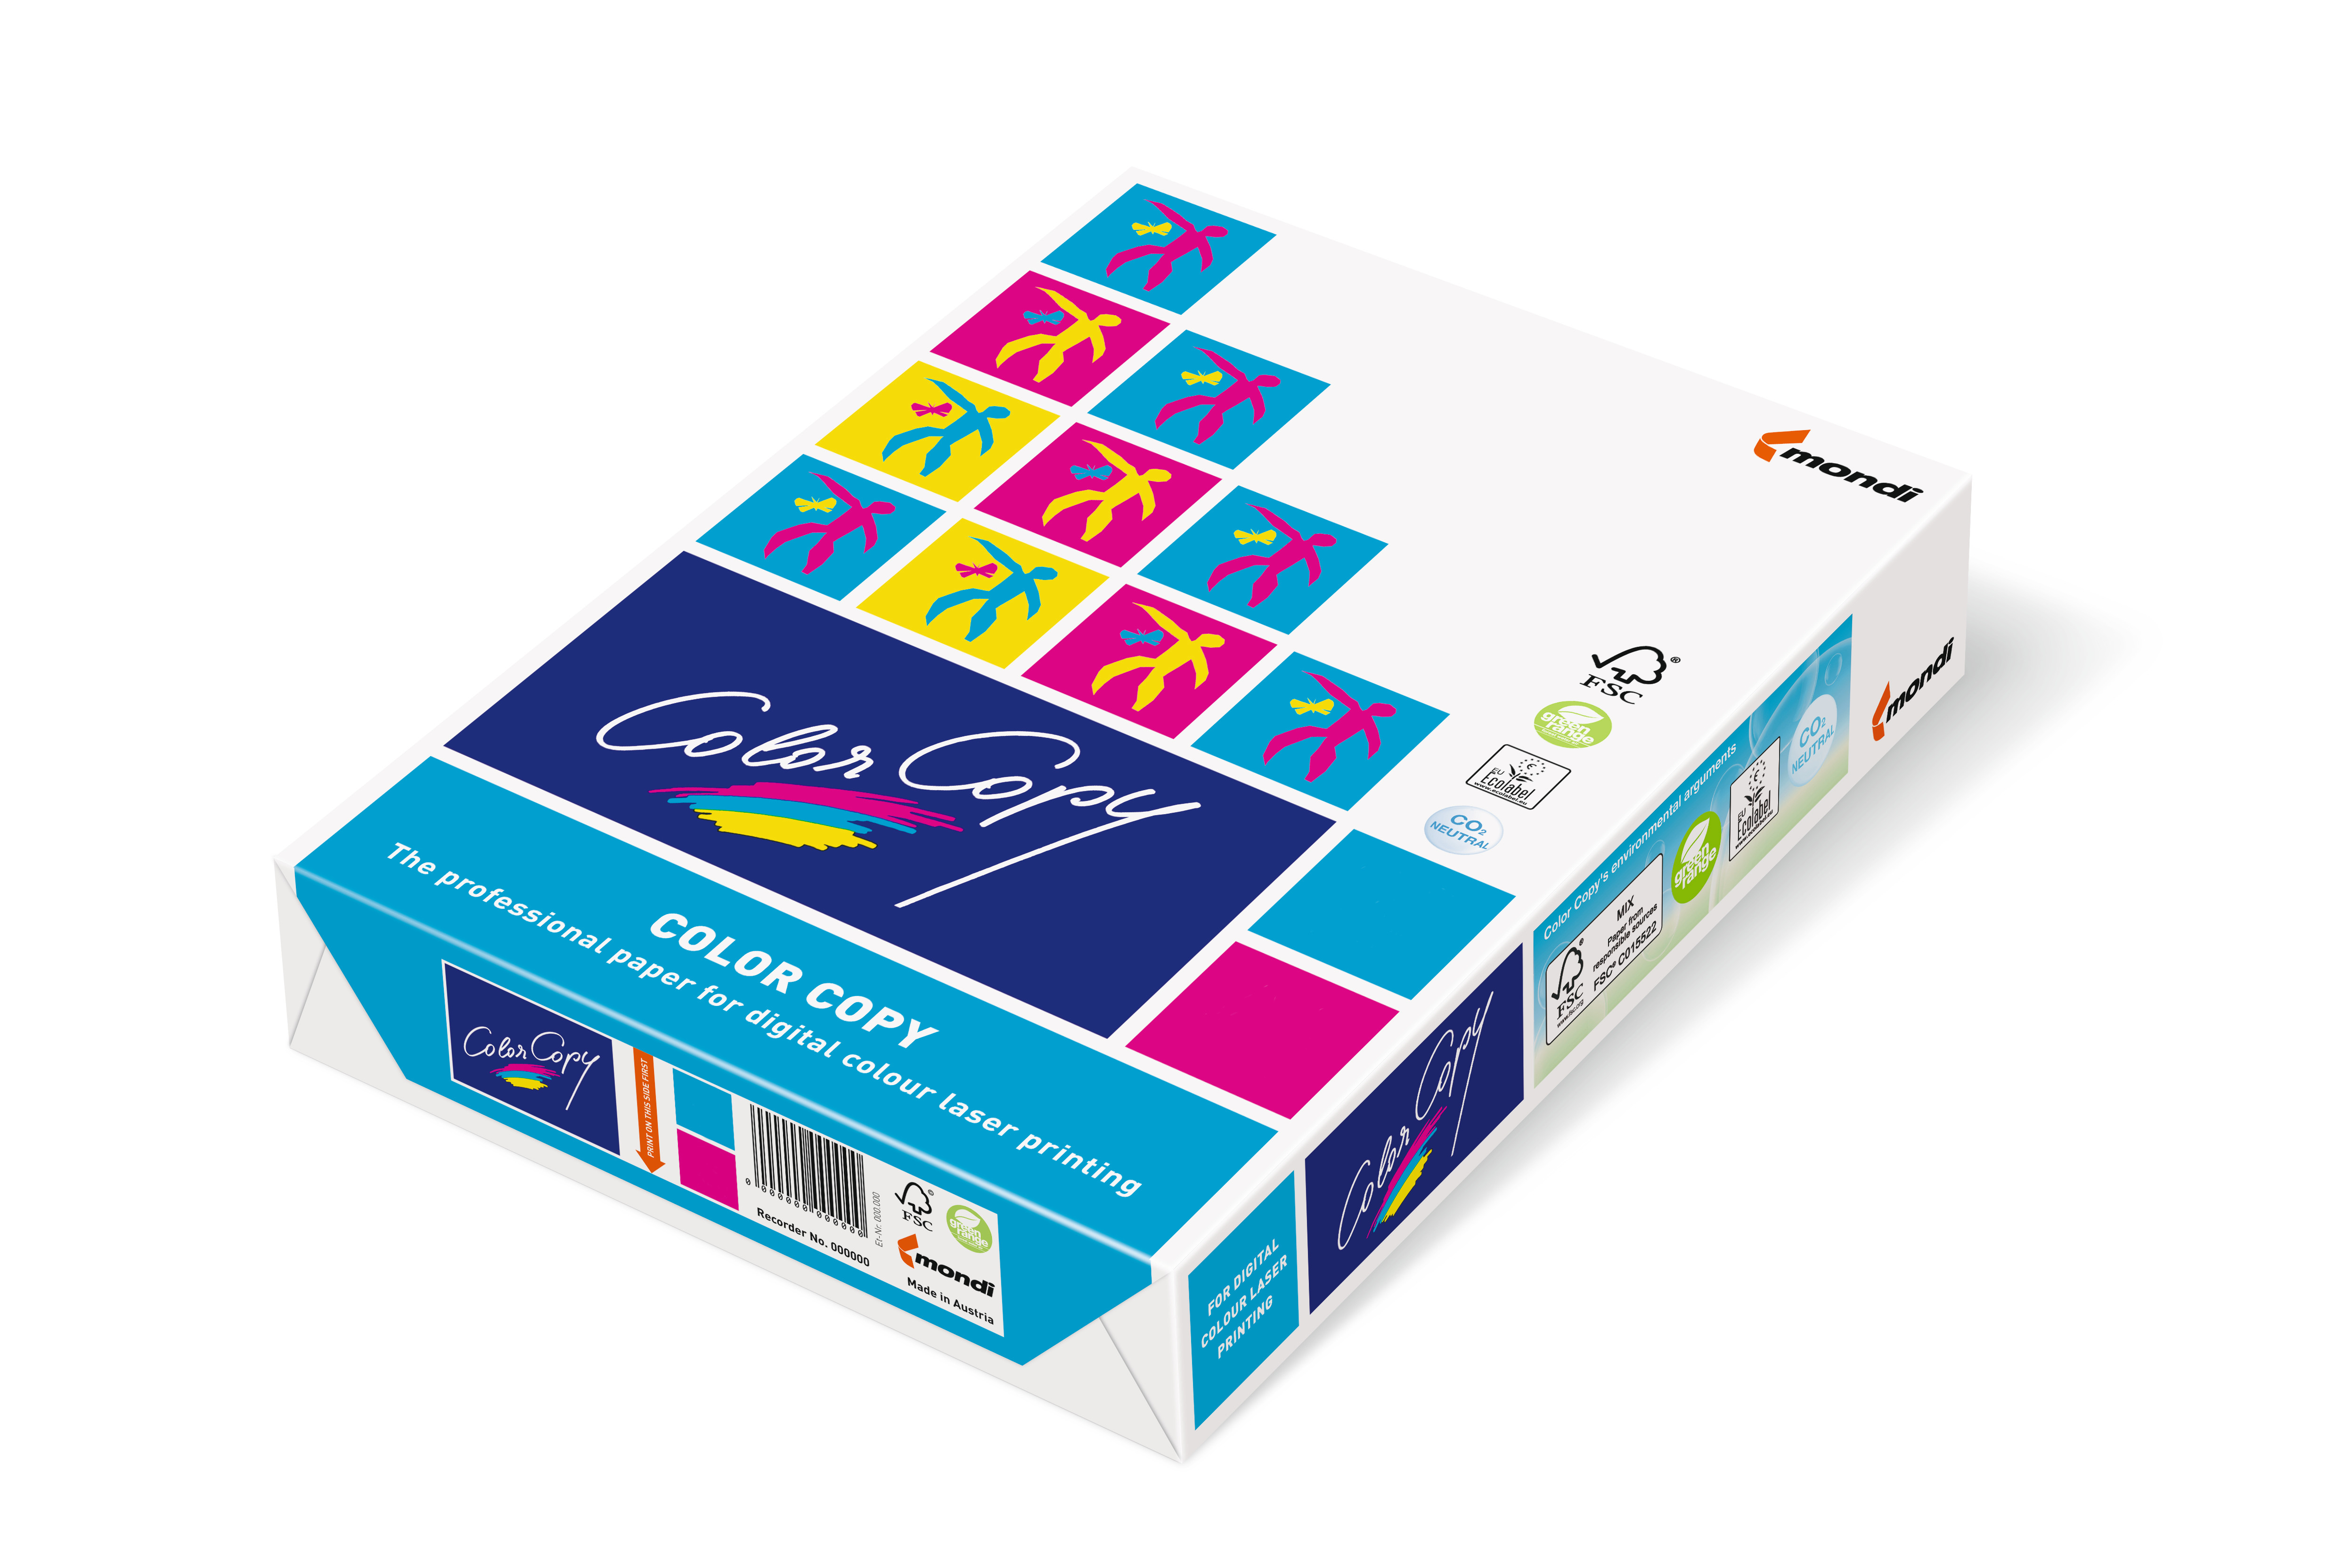 Mondi Color Copy Papier 280g/m² DIN-SRA3 150 Blatt